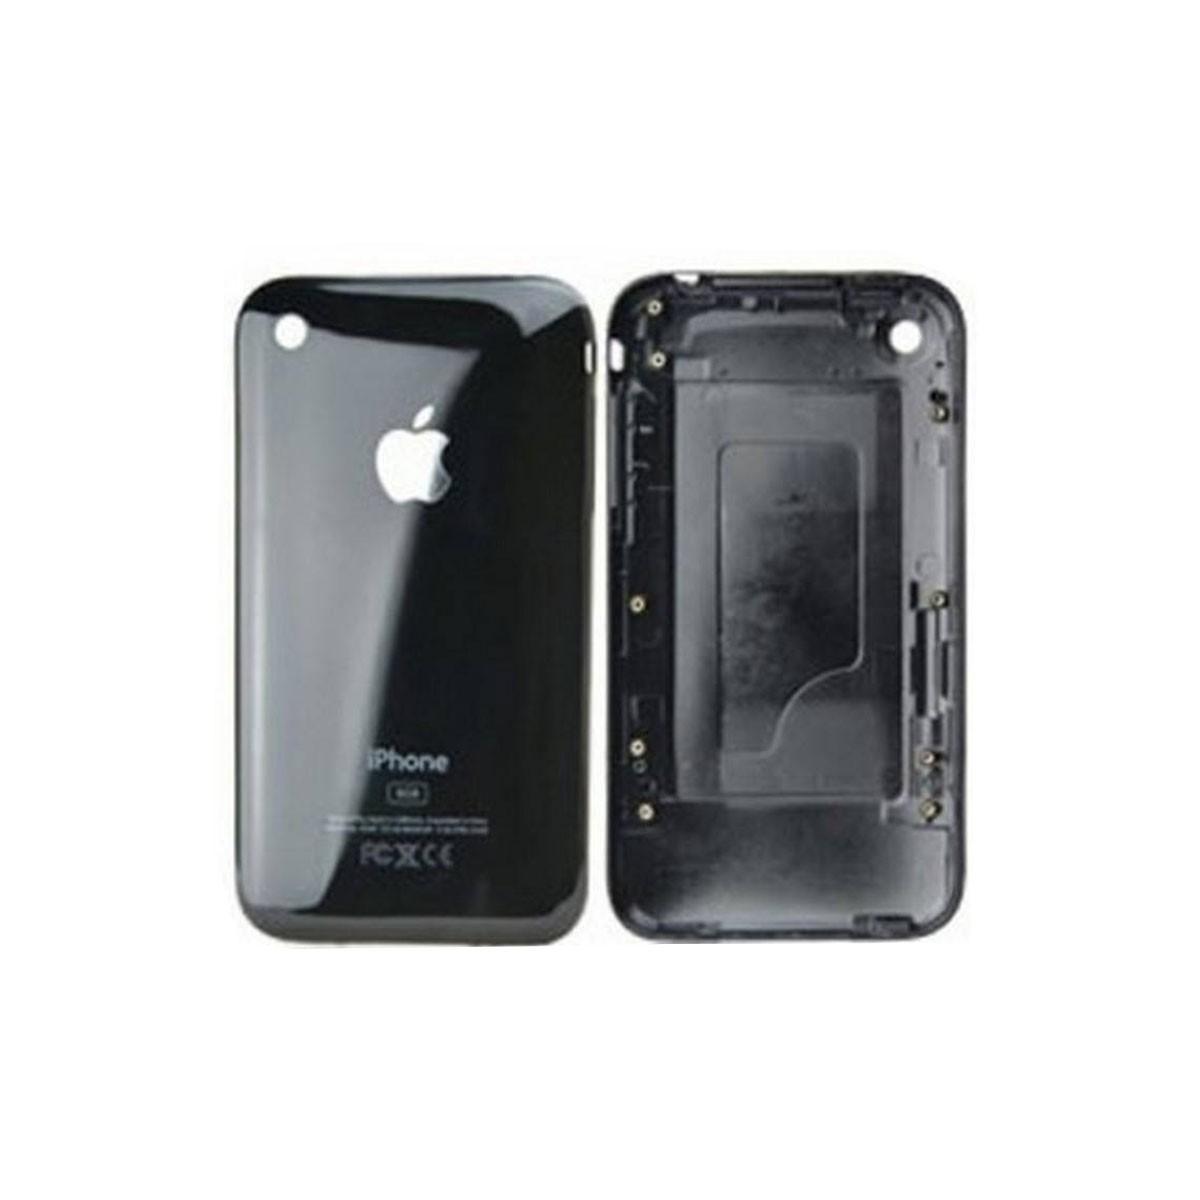 Tapa iphone 3G negra de 8GB